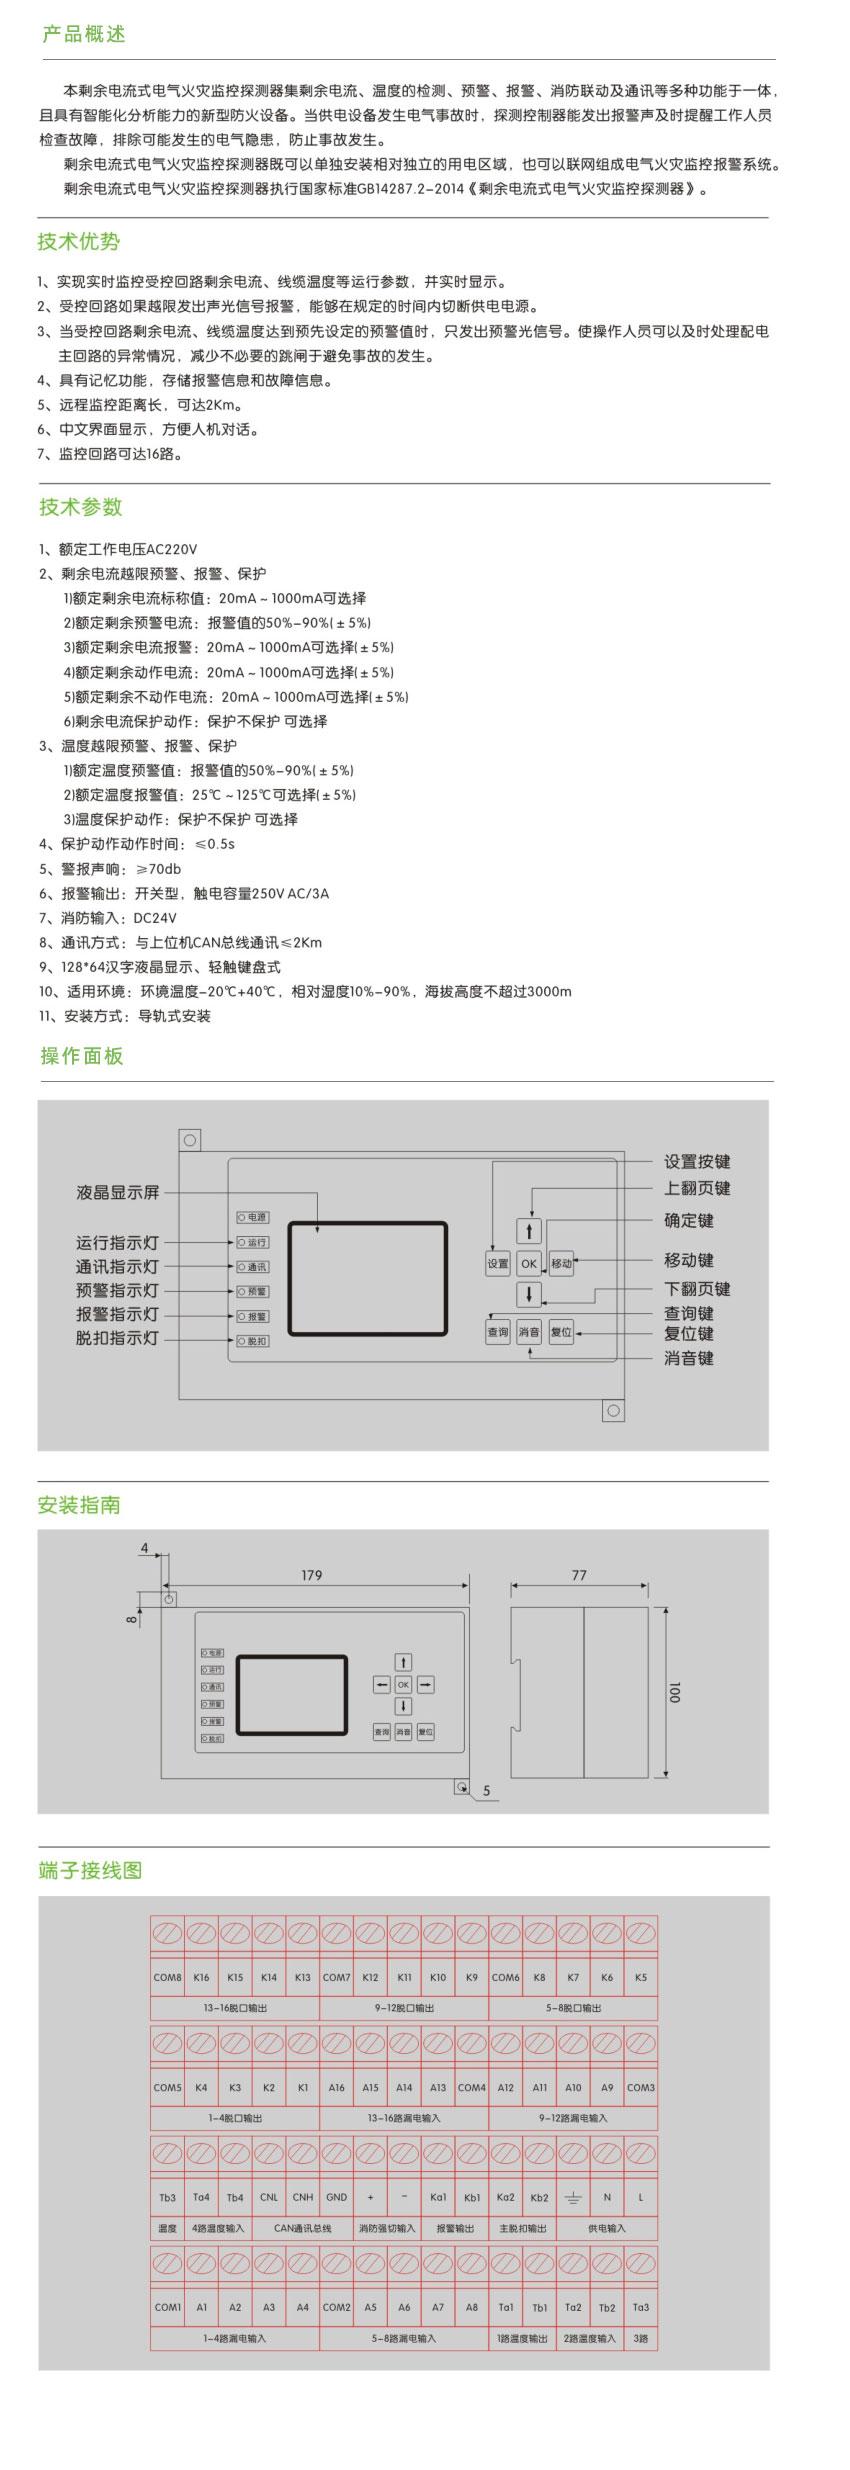 02_3_detail_HRLB-FM(1-16路明装液晶型).jpg